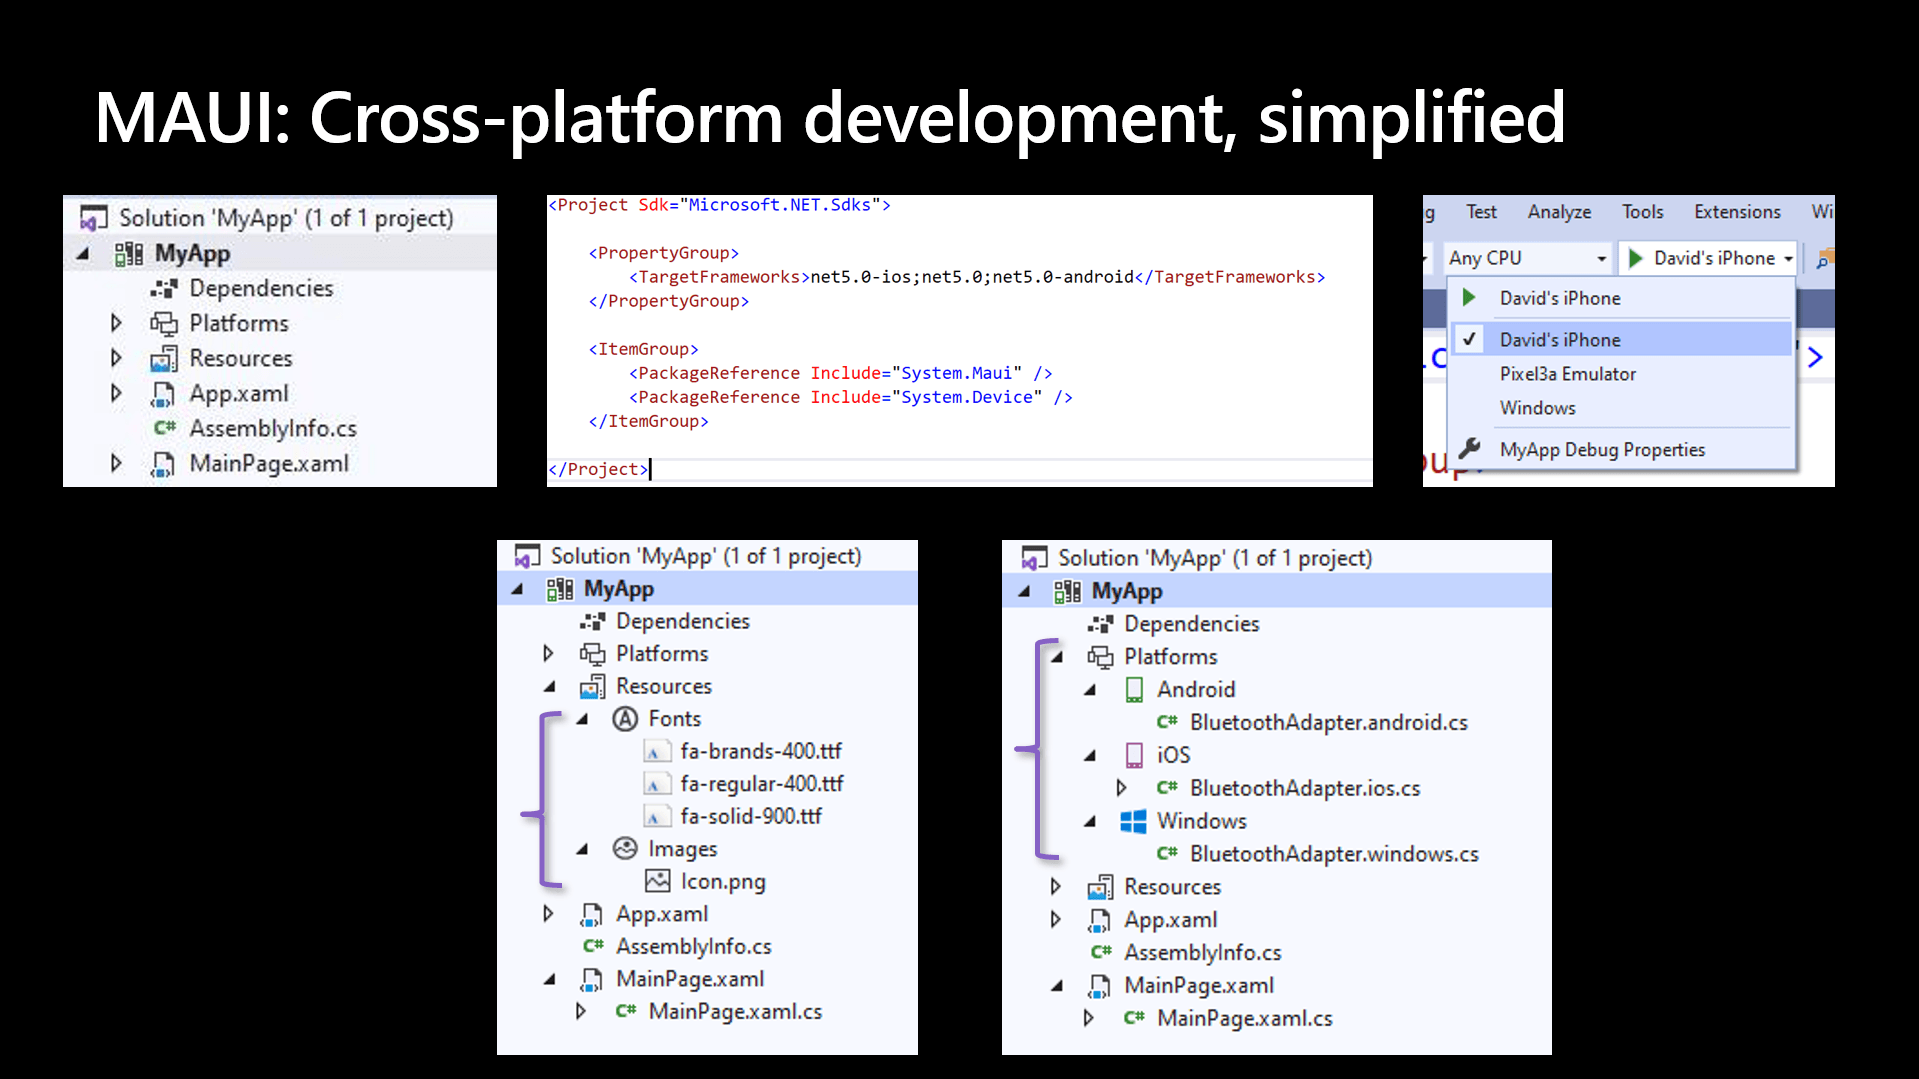 Cross-platform development simplified